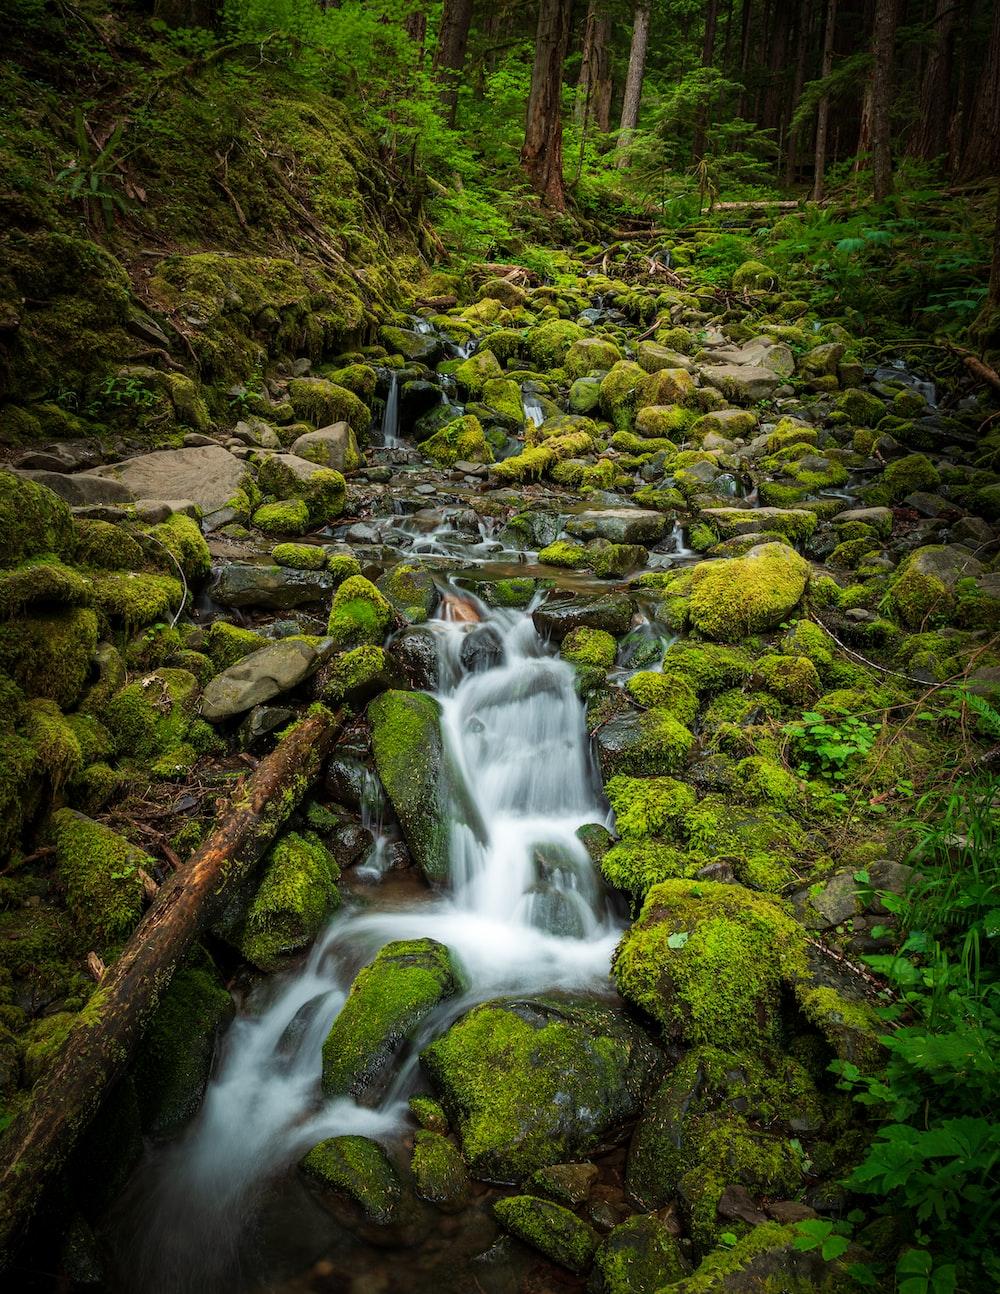 water falls on brown rocks